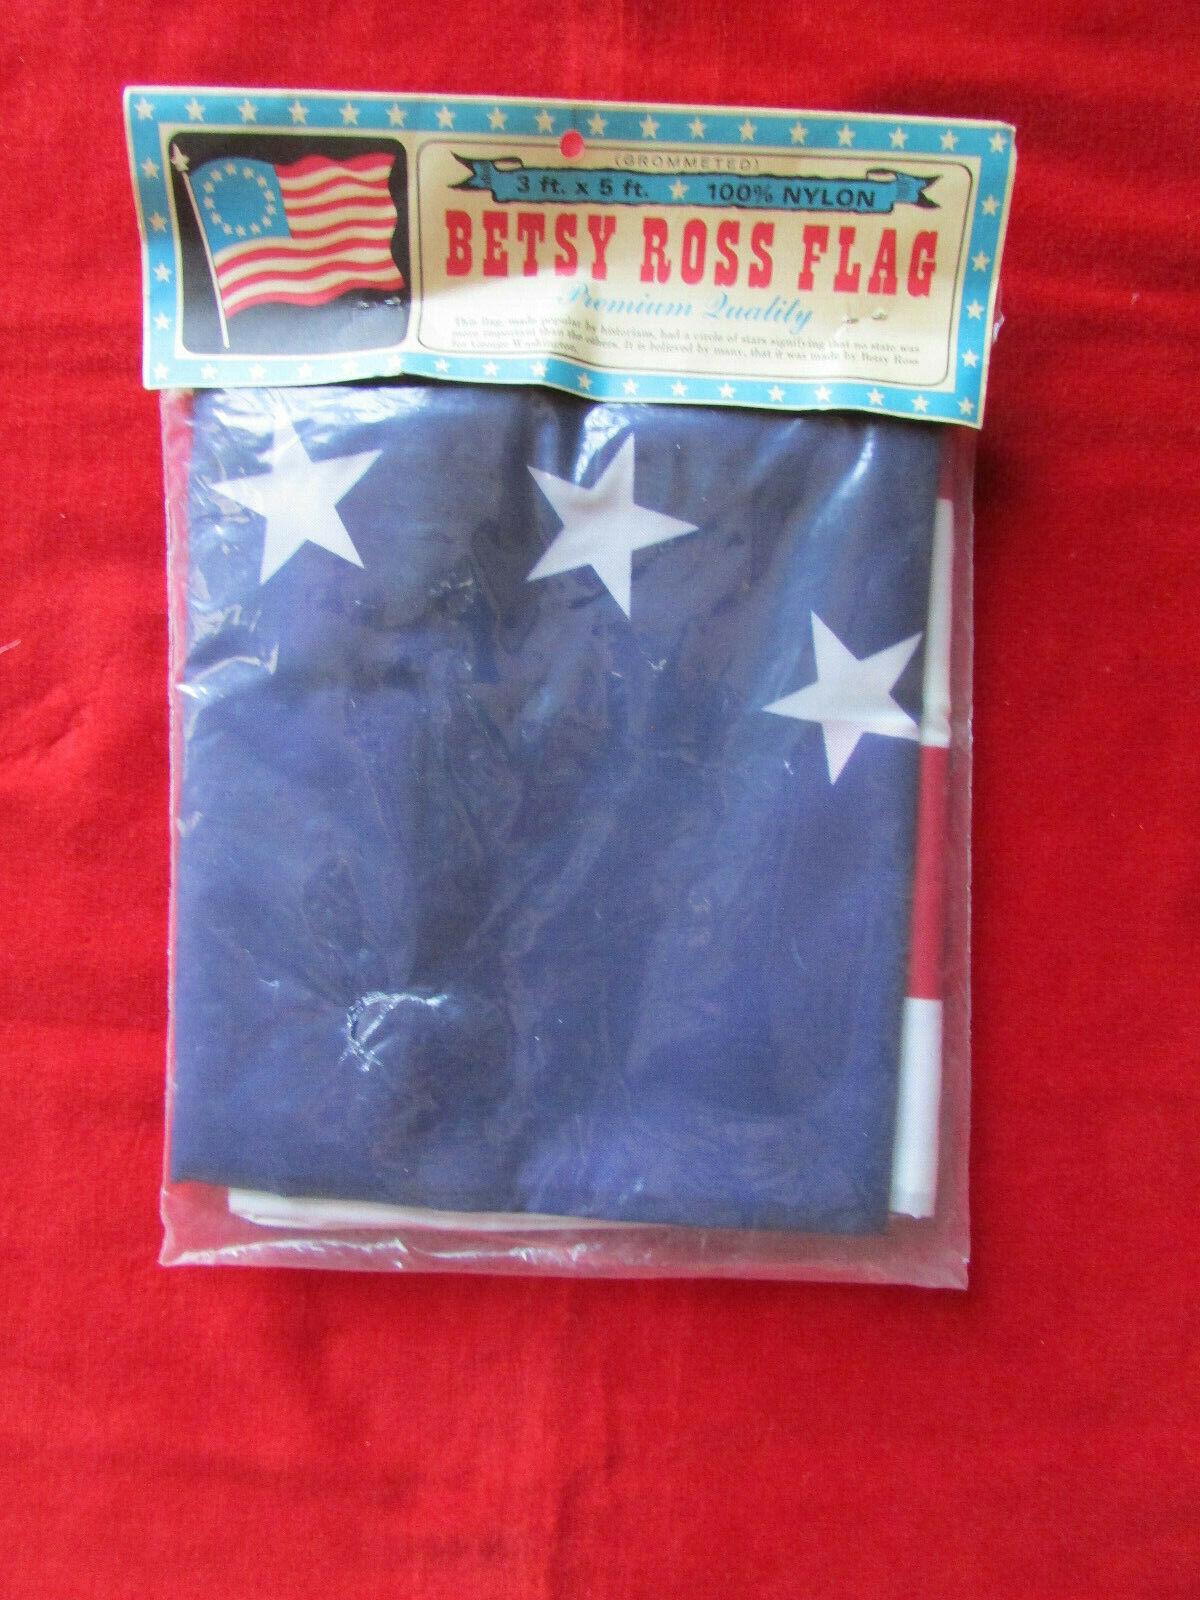 VINTAGE NOS Grommeted Nylon Betsy Ross Flag America 1776 3 x